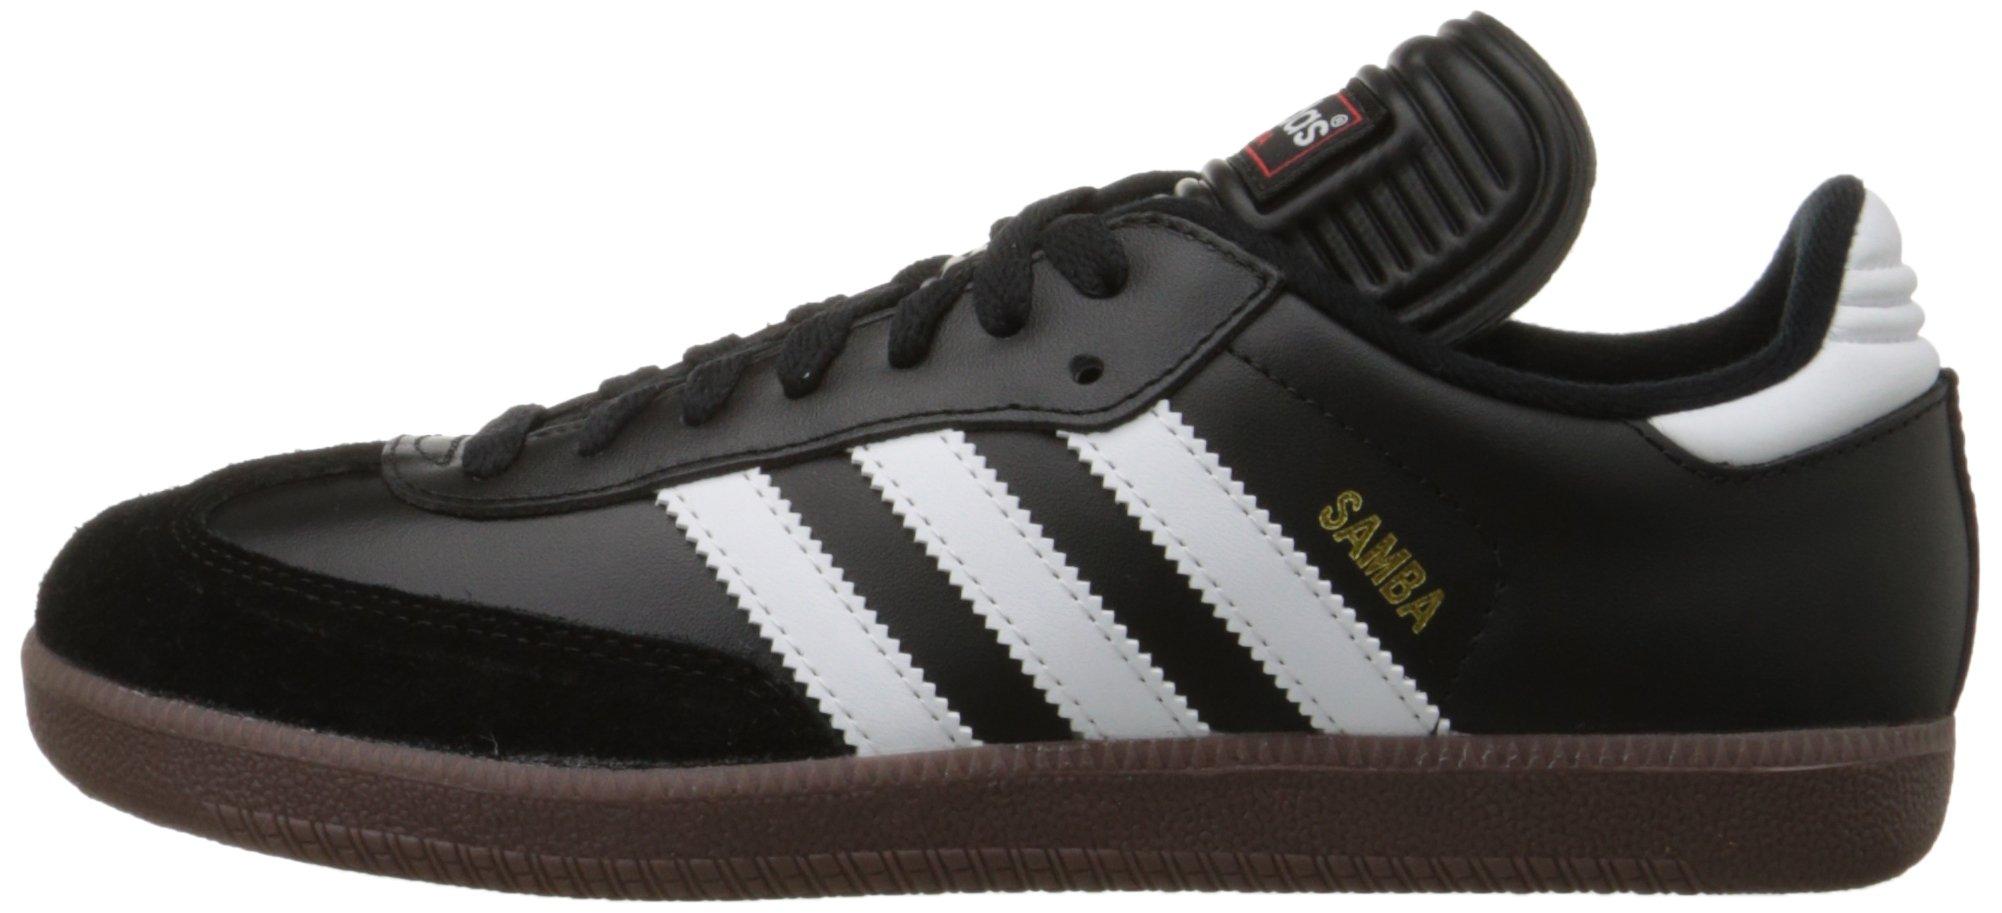 28   [adidas samba classic schuhe, weiße adidas - usa]